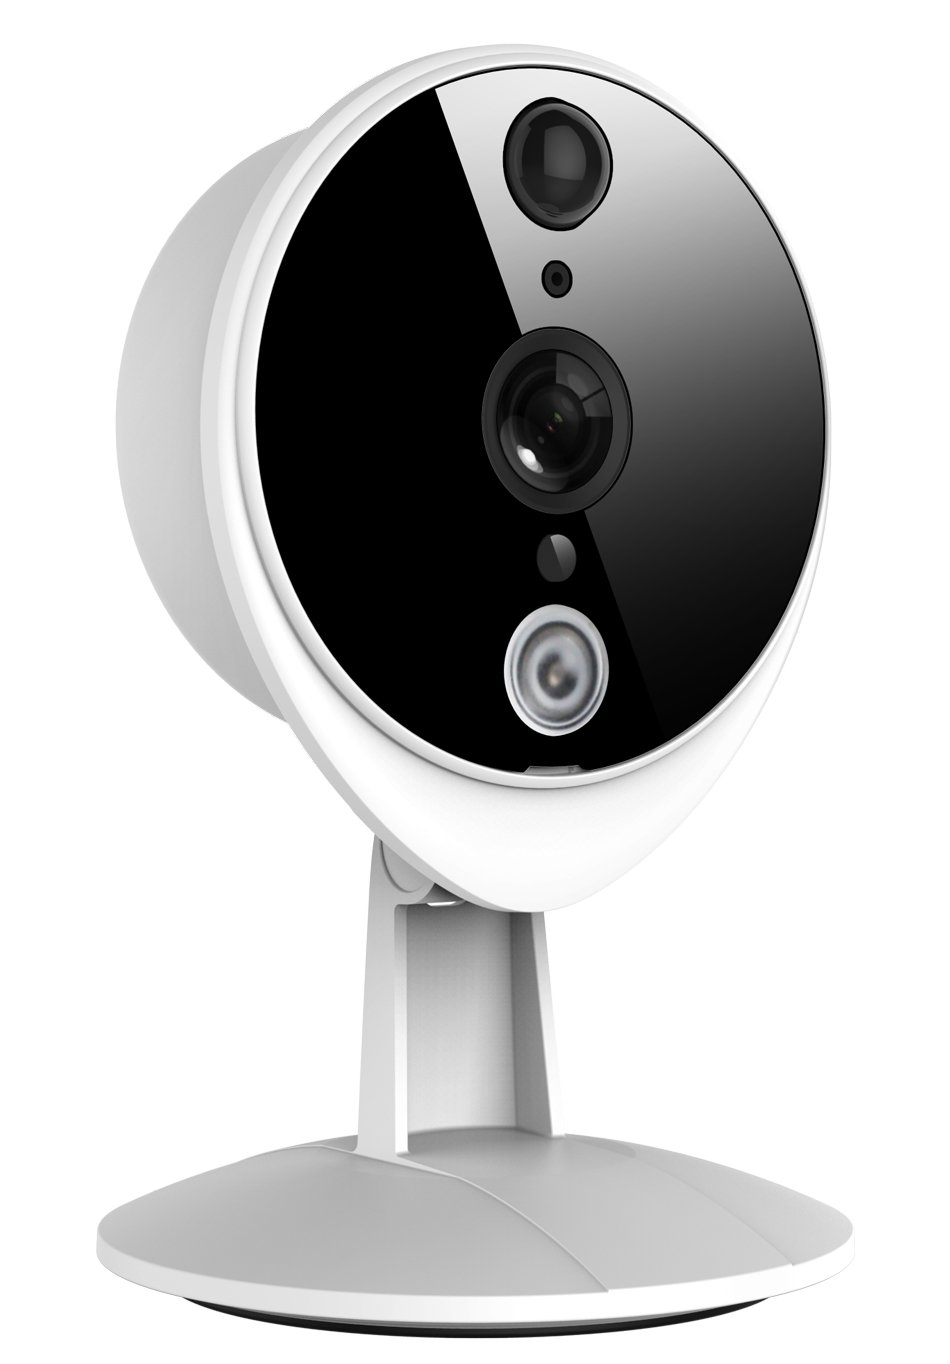 Caméra de vidéosurveillance intérieure Vigilians.